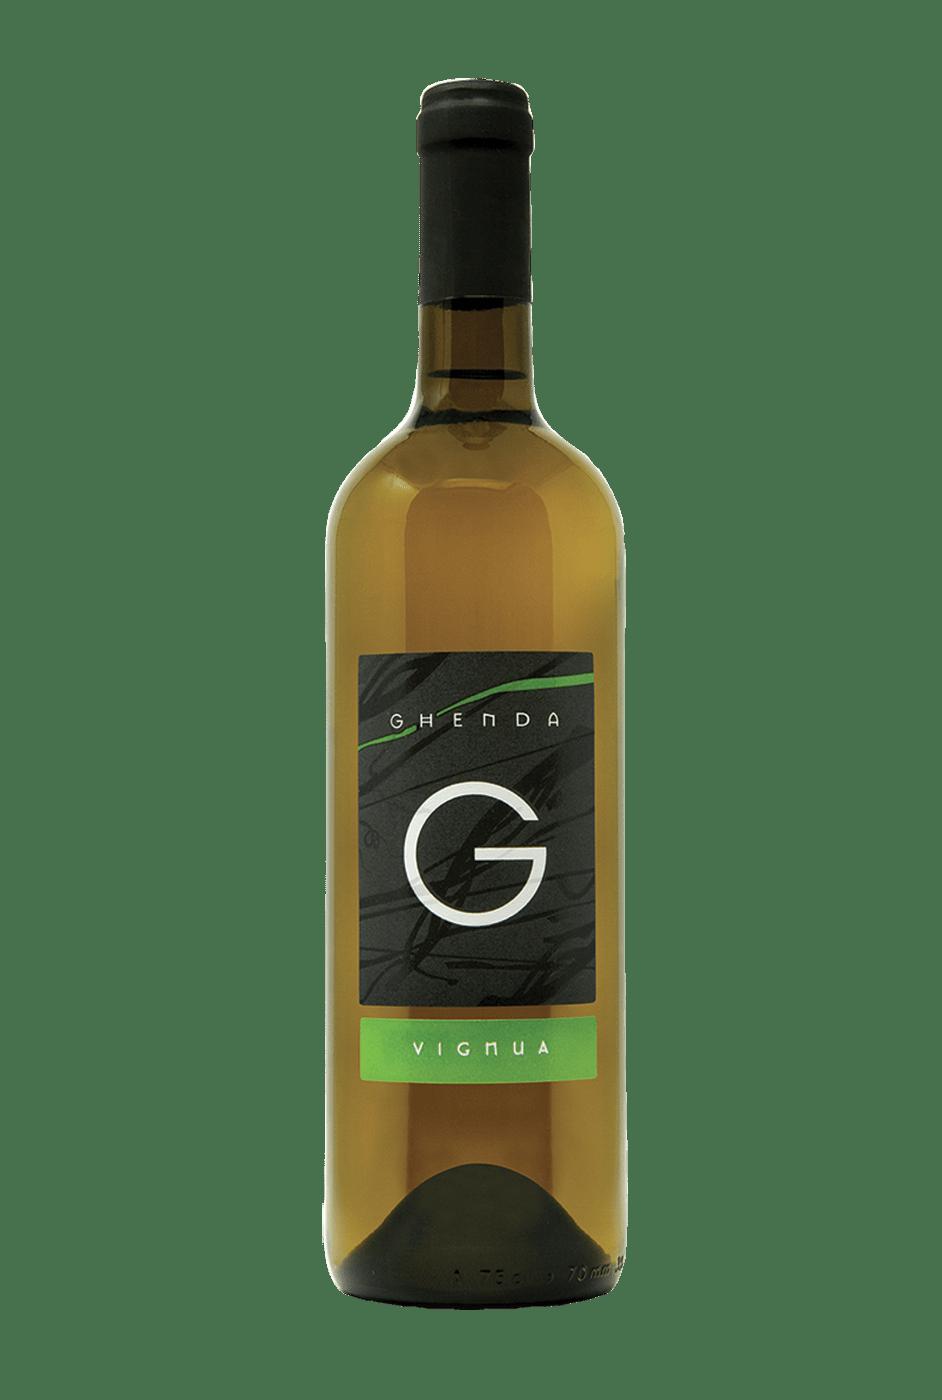 Vino Bianco Ghenda Vignua